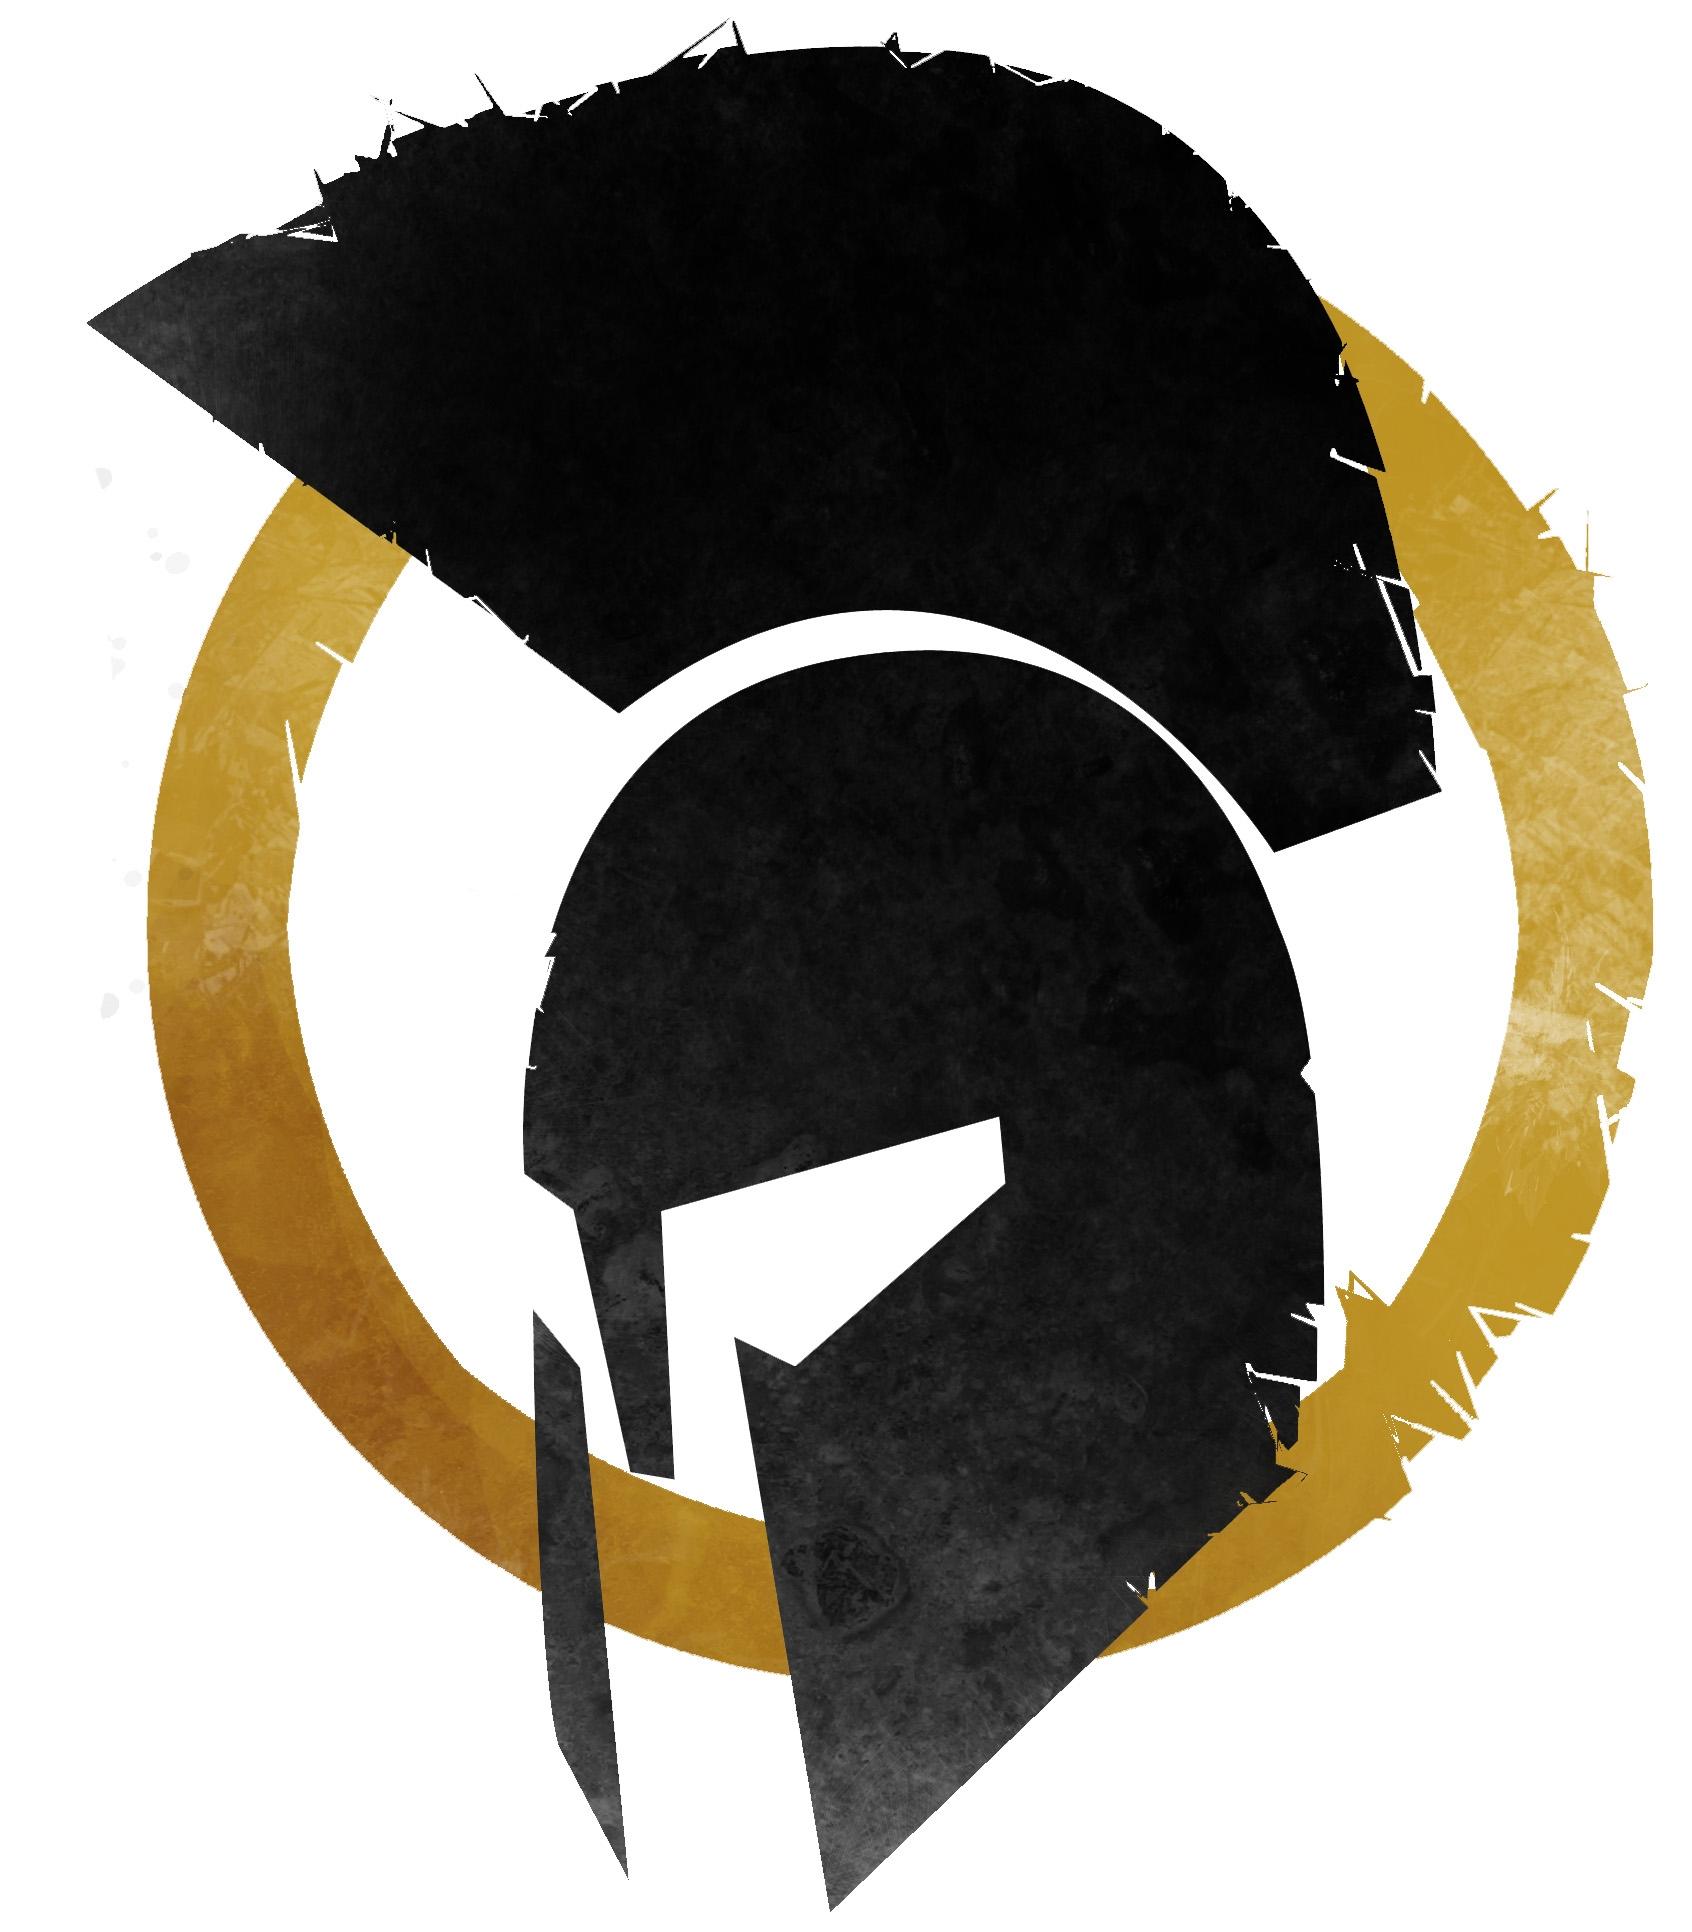 Spartan Helmet Wallpaper HD - WallpaperSafari